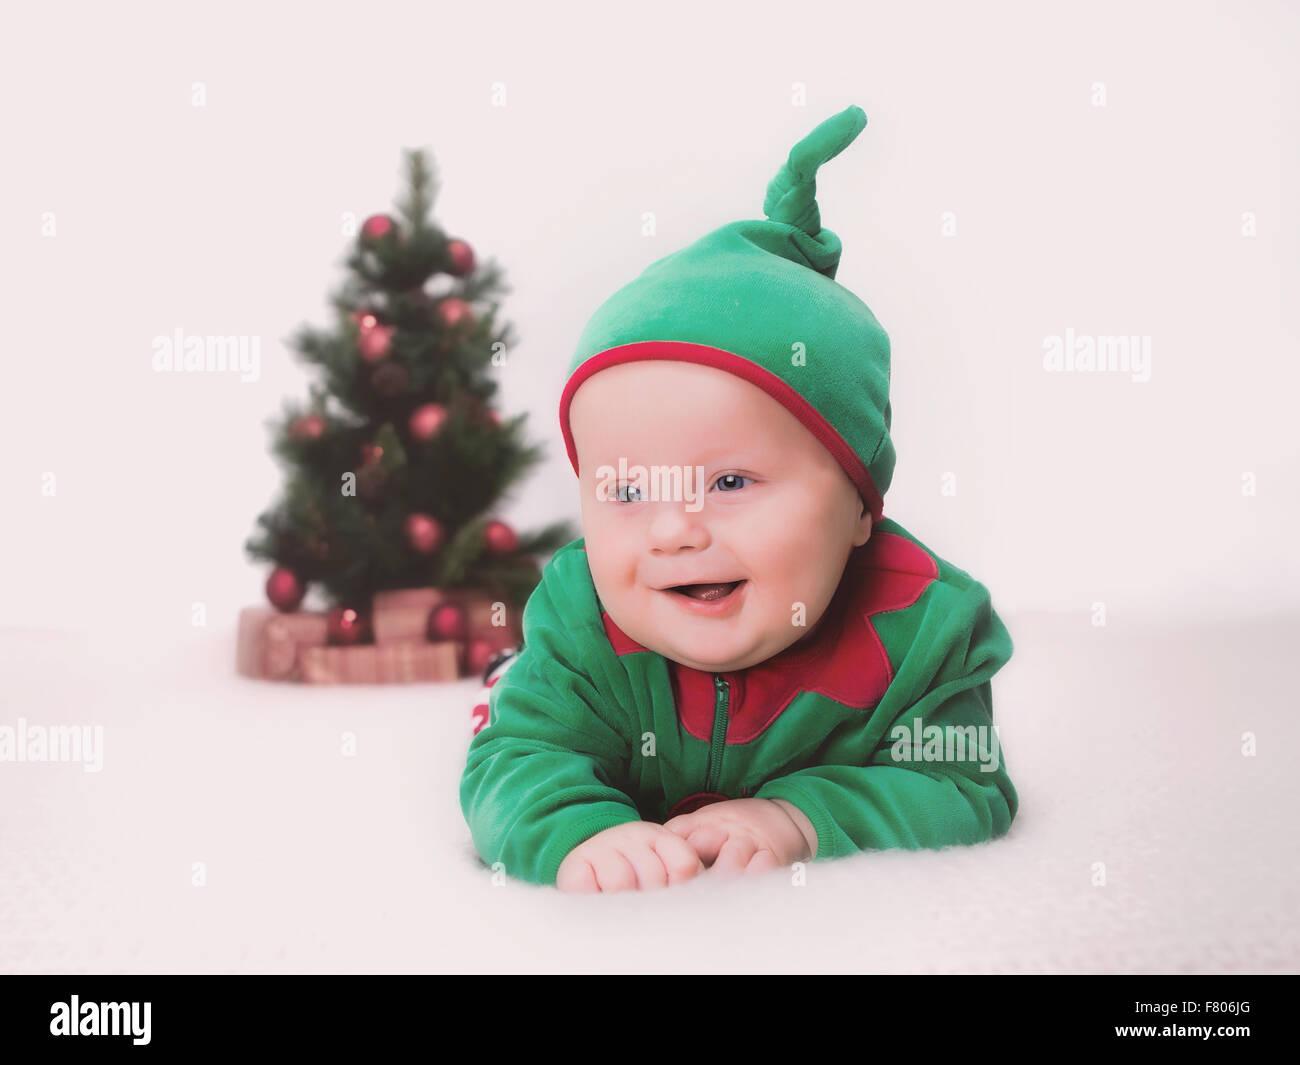 Santa's little helper - Stock Image